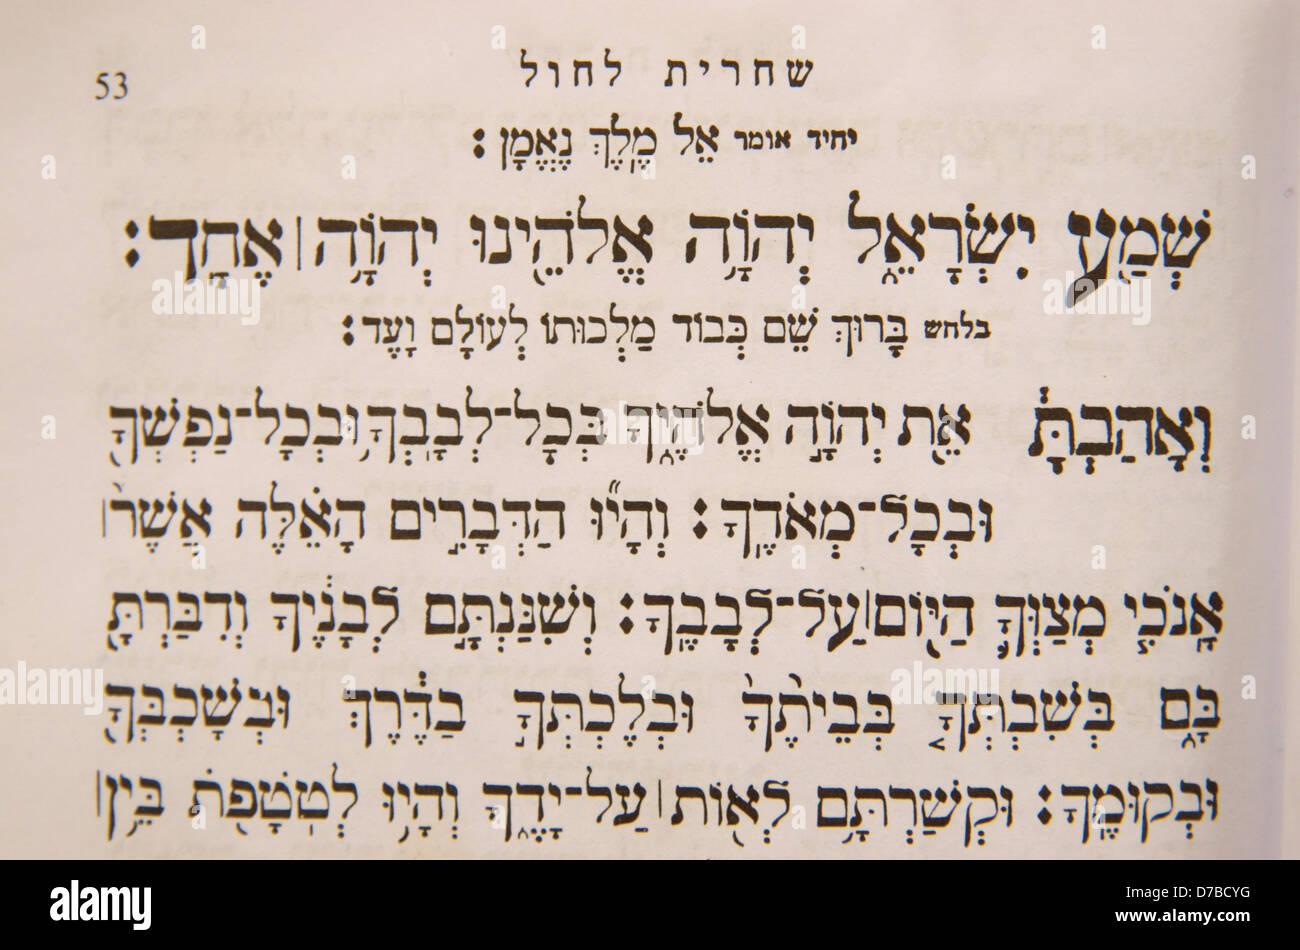 Shema israel chabad-4088